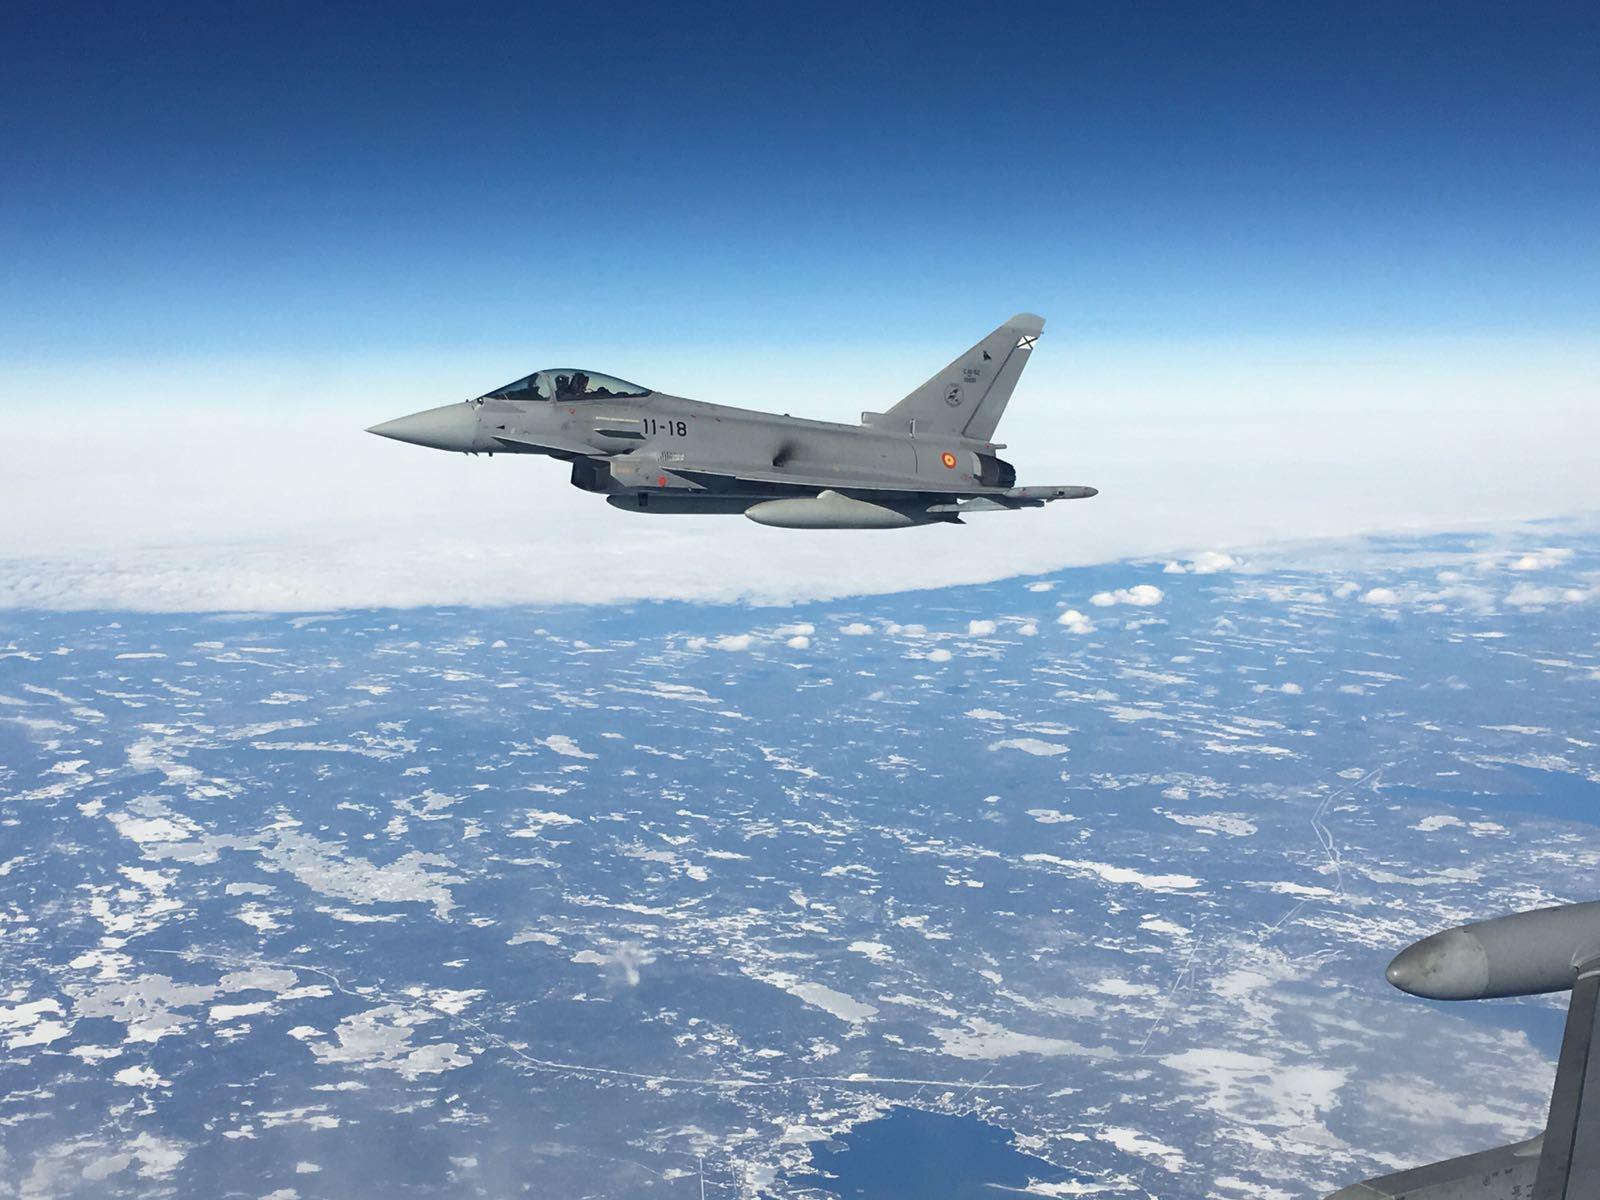 Foto de archivo Eurofighter